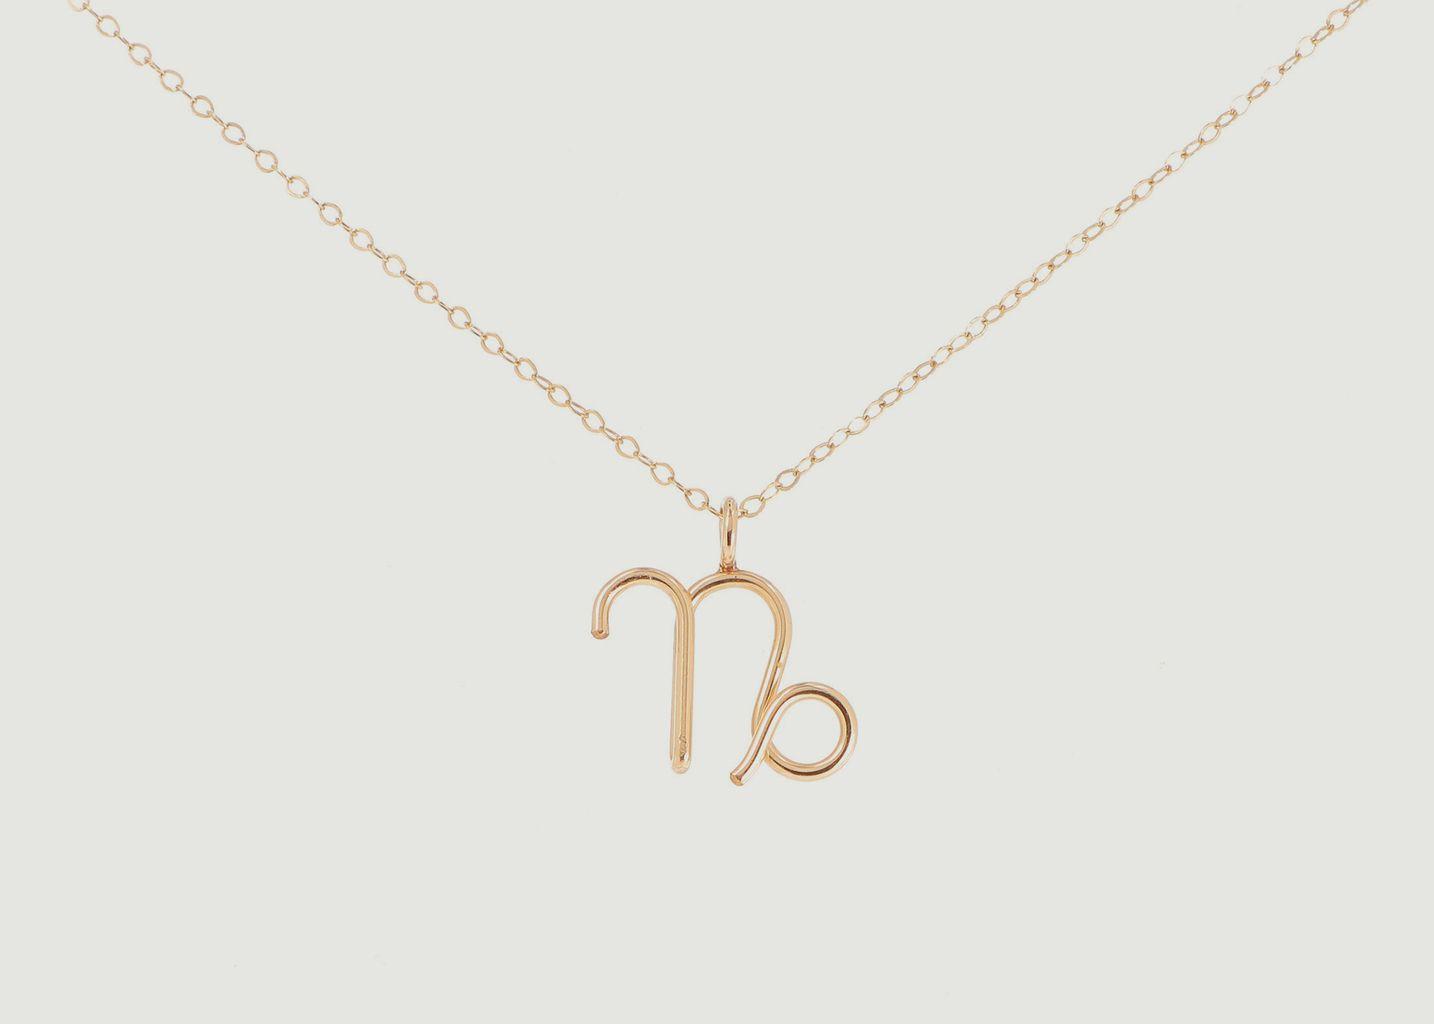 Collier chaîne avec pendentif Astro Capricorne - Atelier Paulin